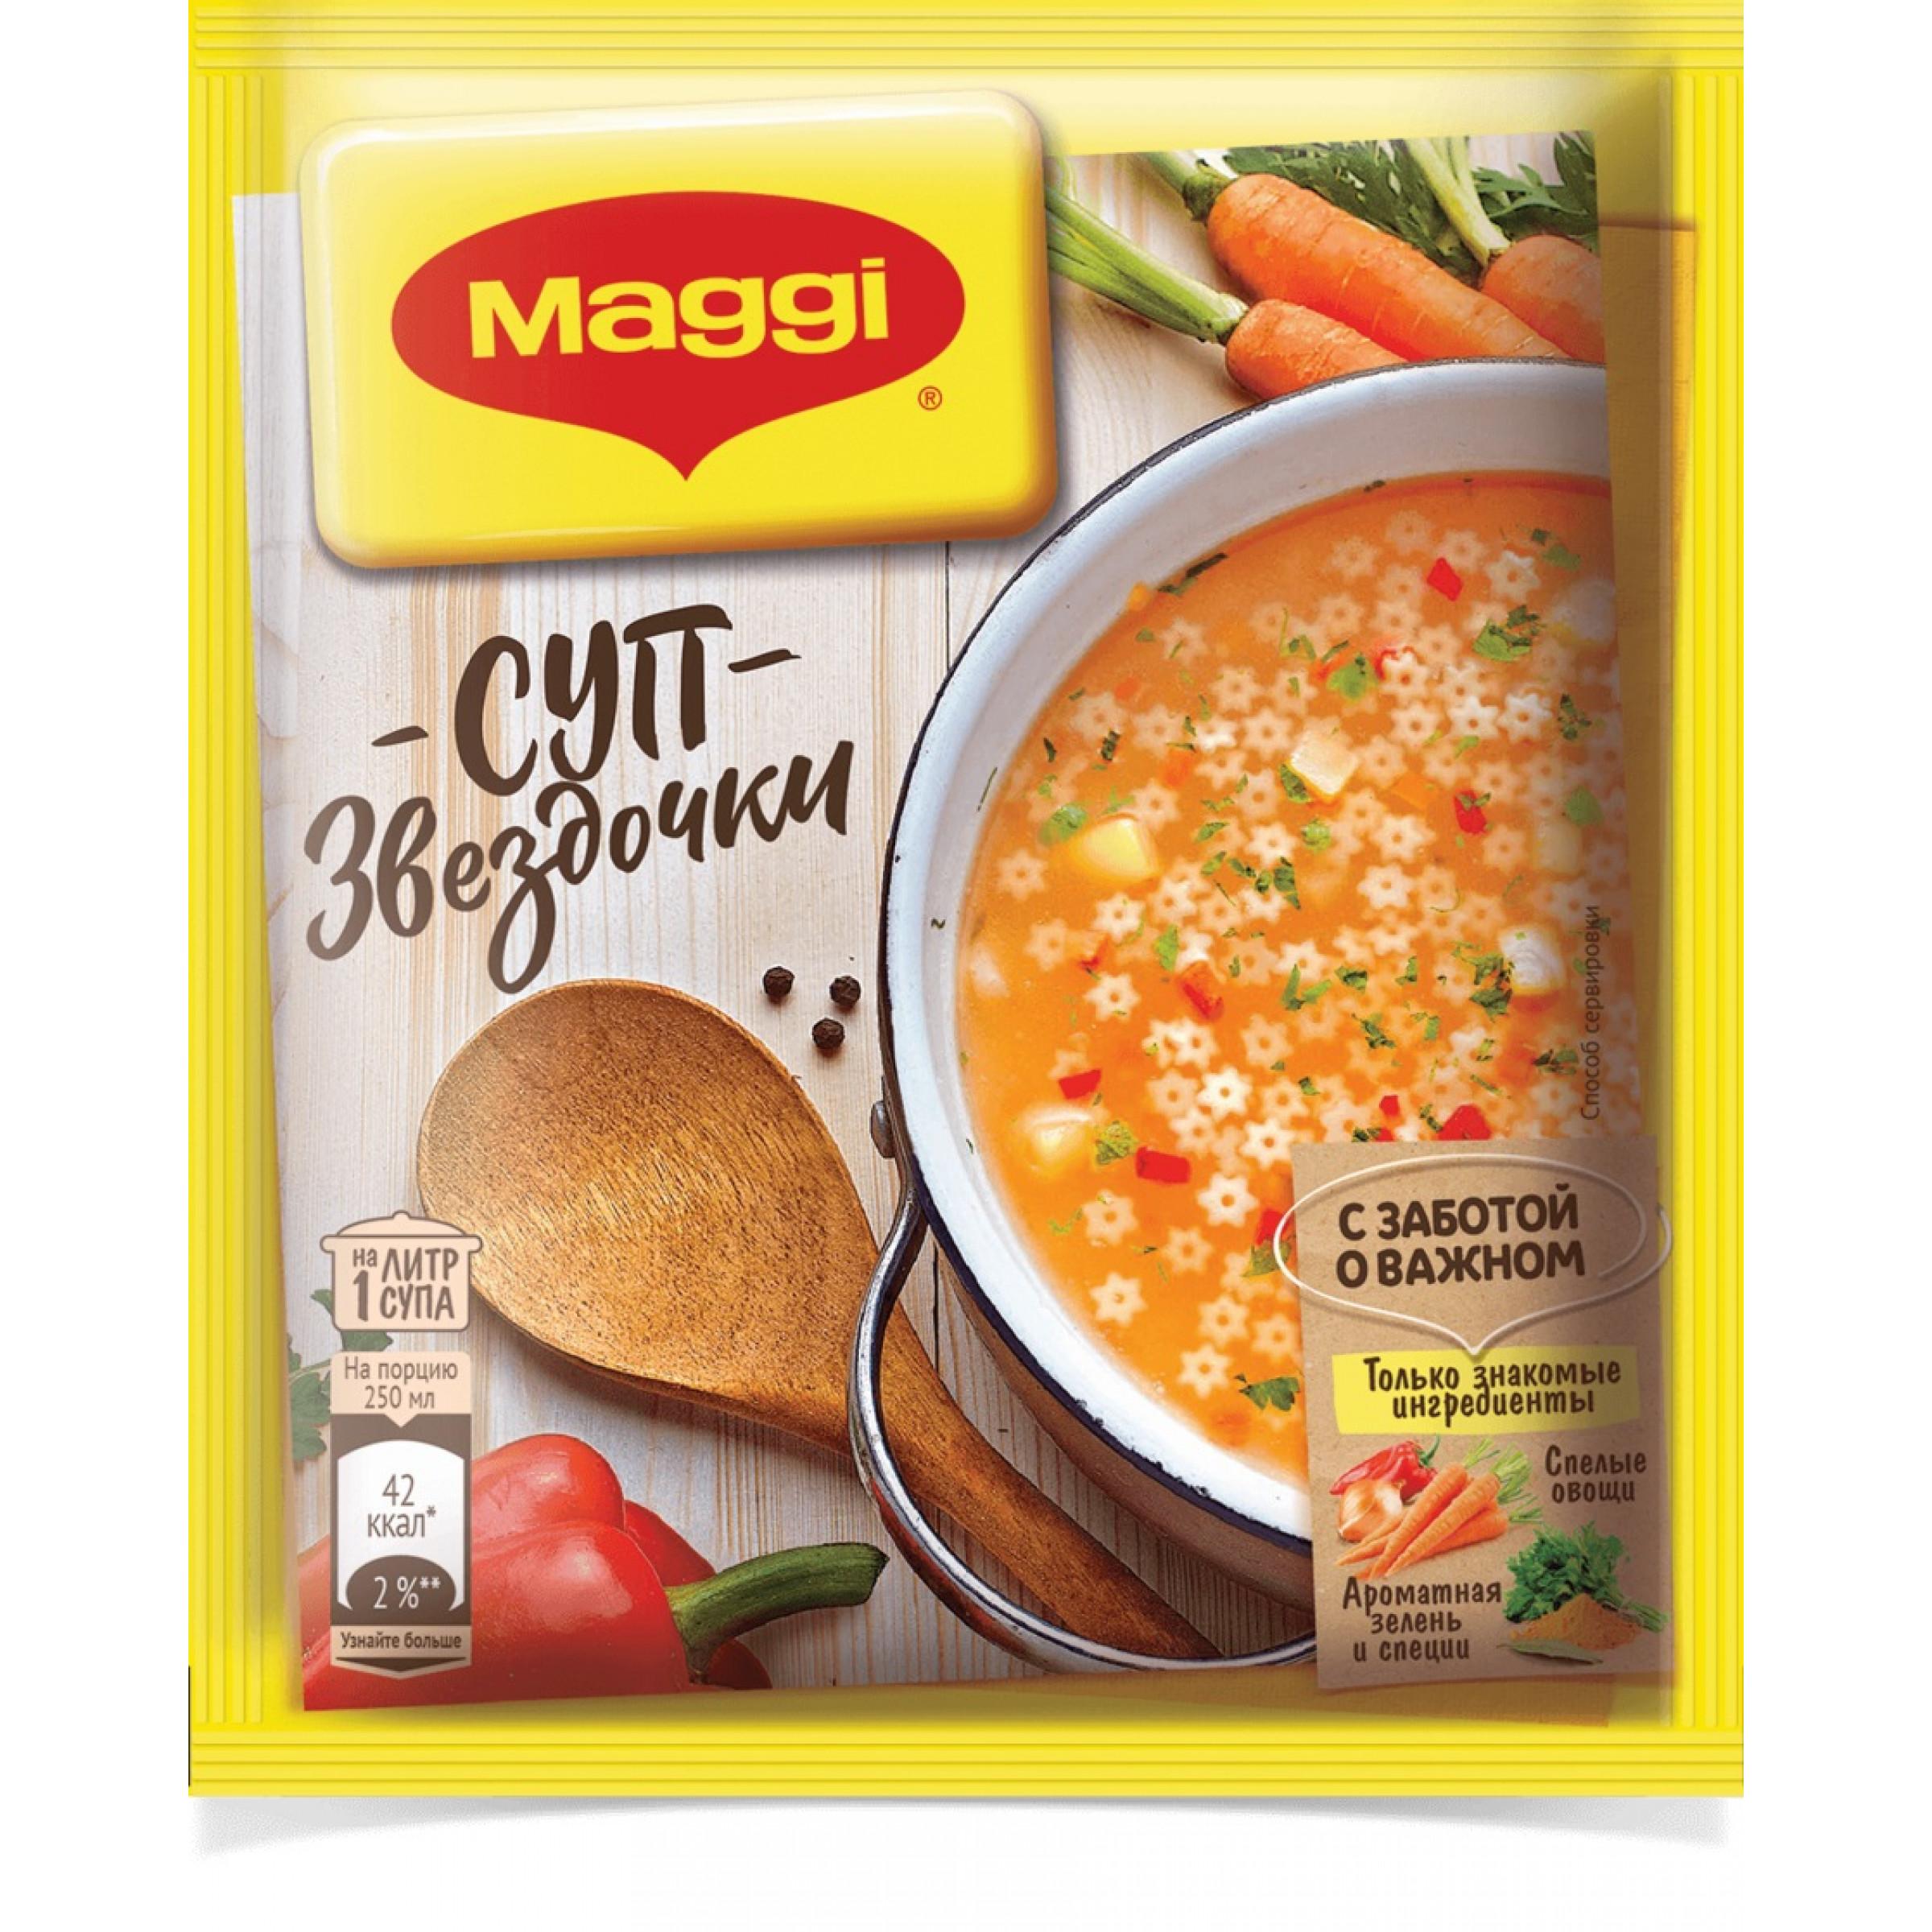 MAGGI® Суп Звездочки, 54 гр